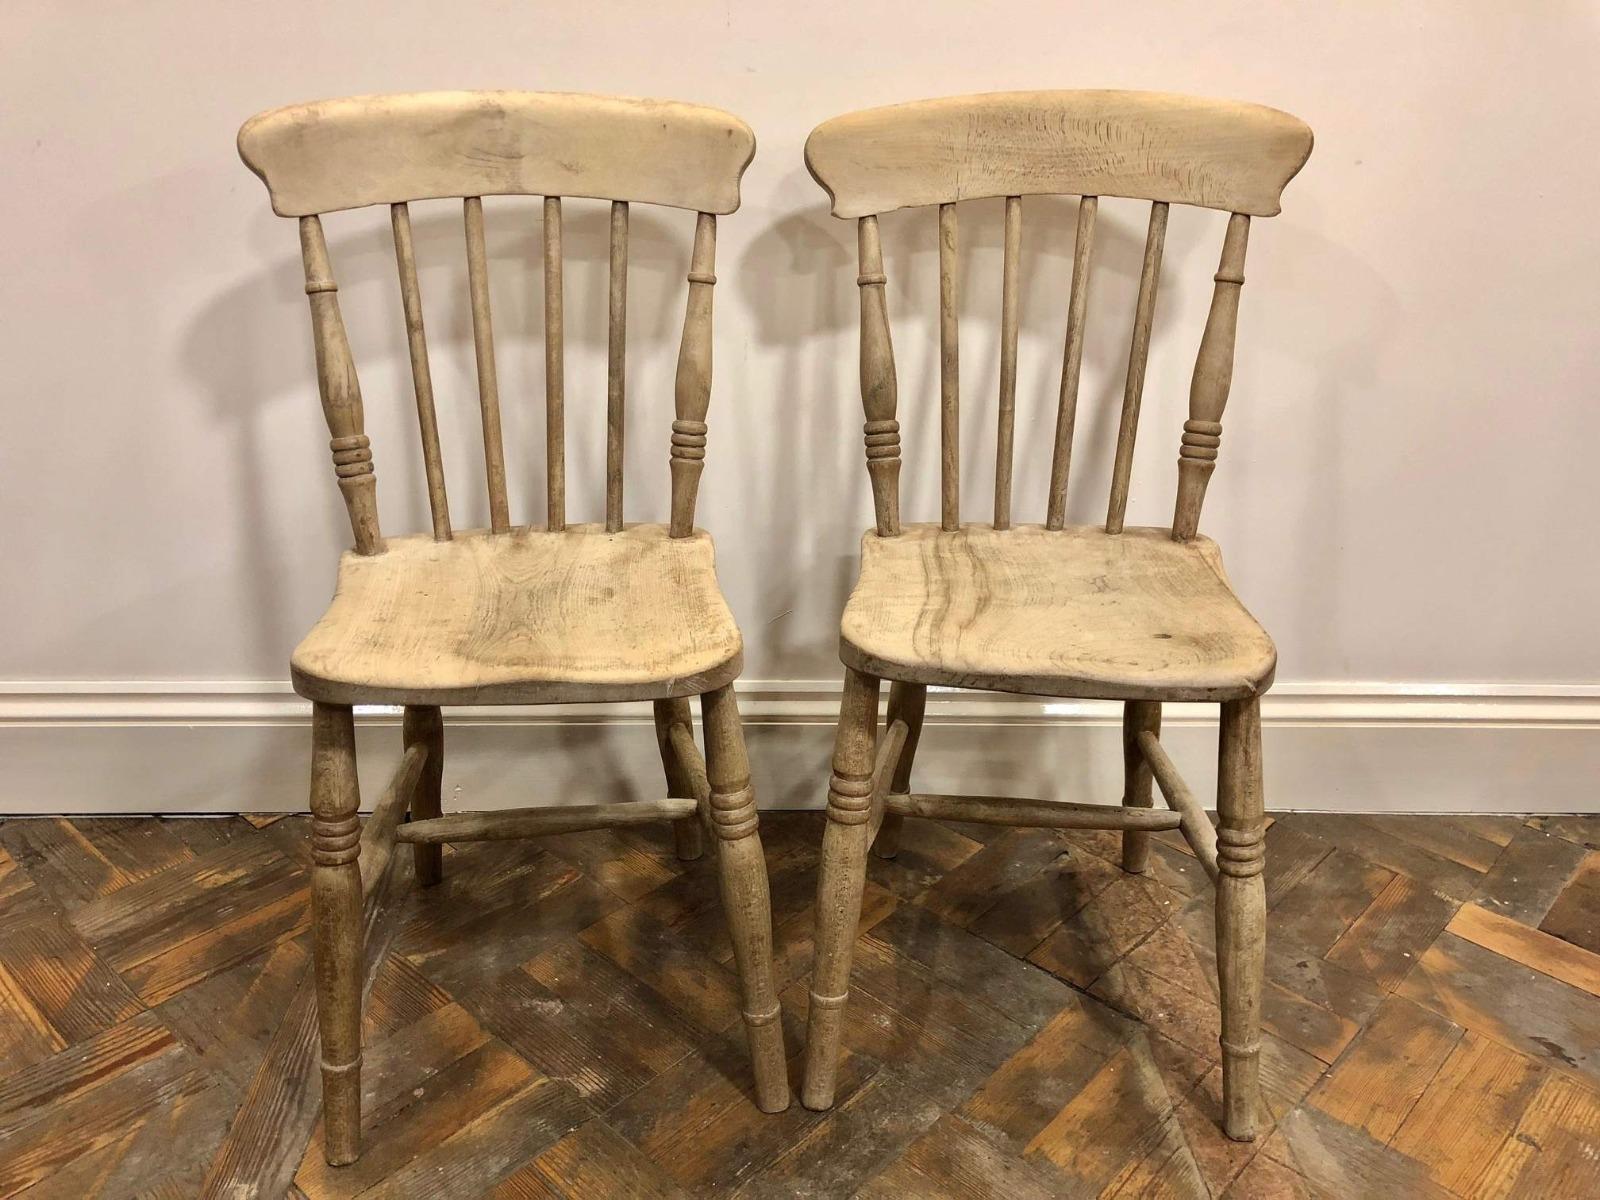 Pair of Stripped Pine Farmhouse Kitchen Chairs C.8 - B-8